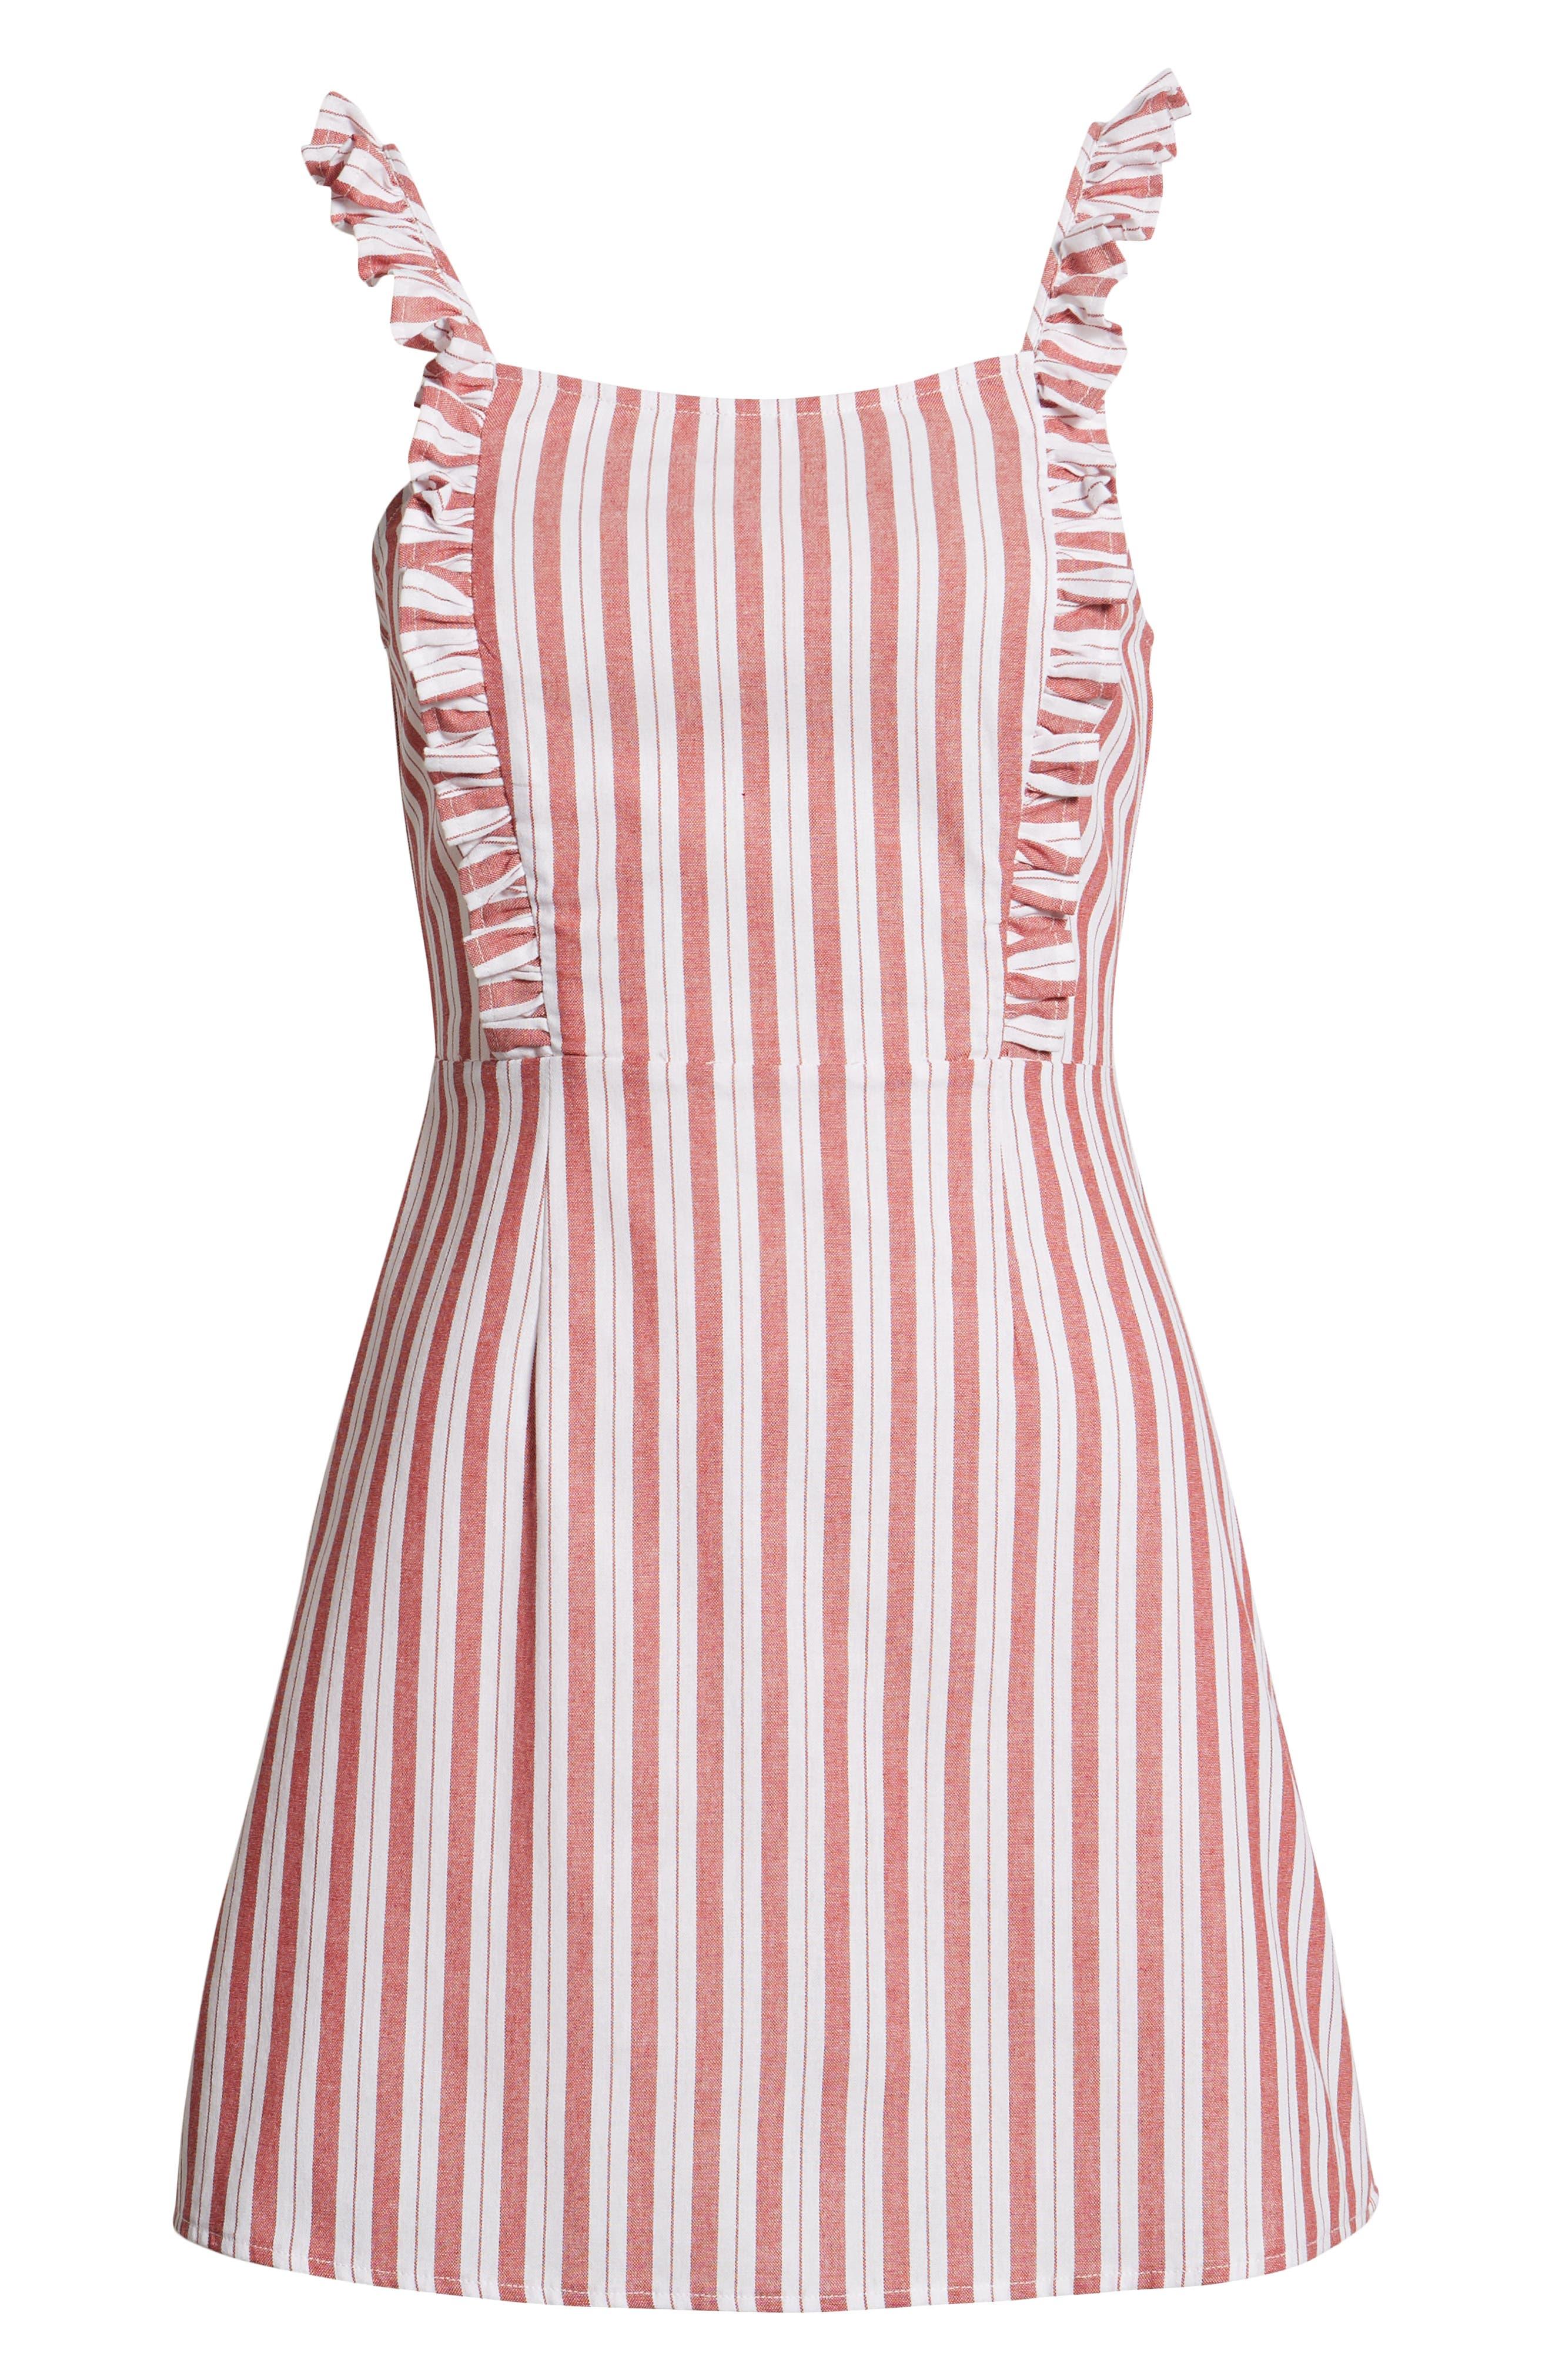 Acacia Stripe Ruffle Dress,                             Alternate thumbnail 7, color,                             600